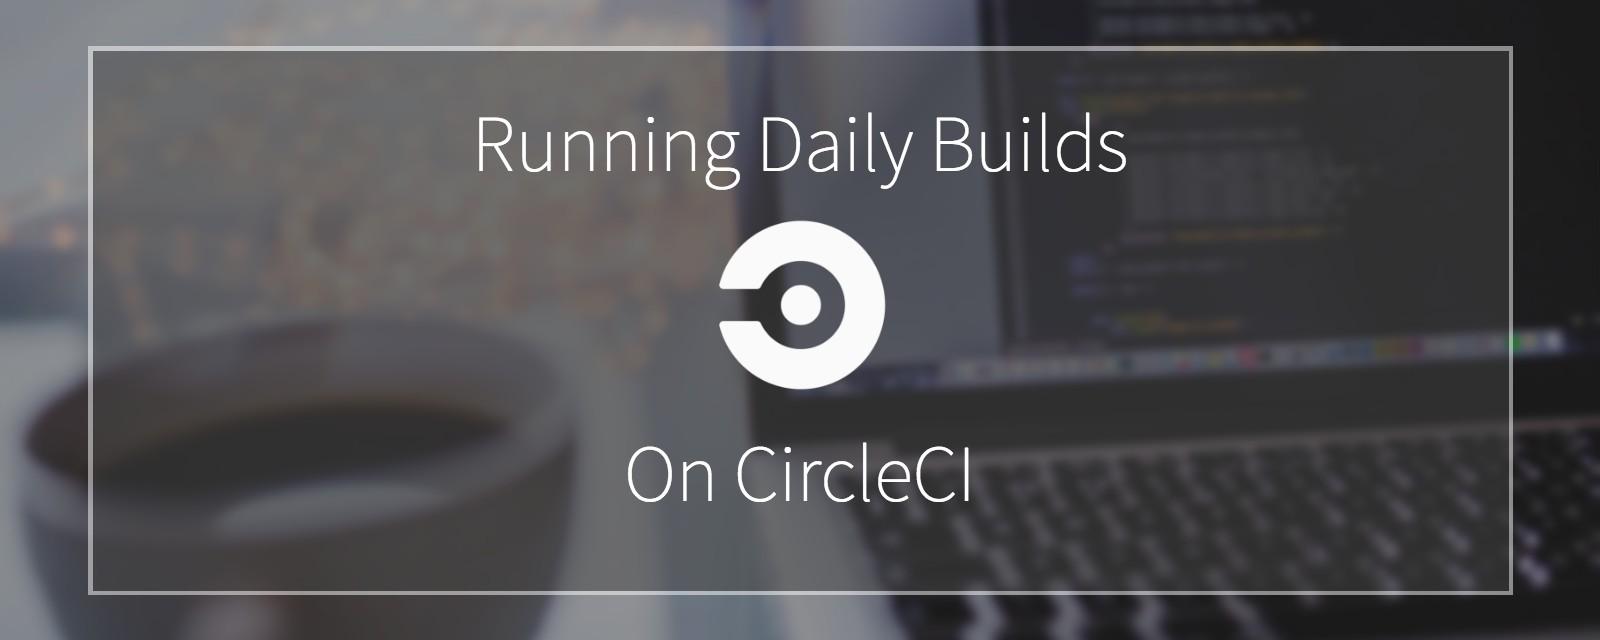 Running Daily Builds on CircleCI - CircleCI